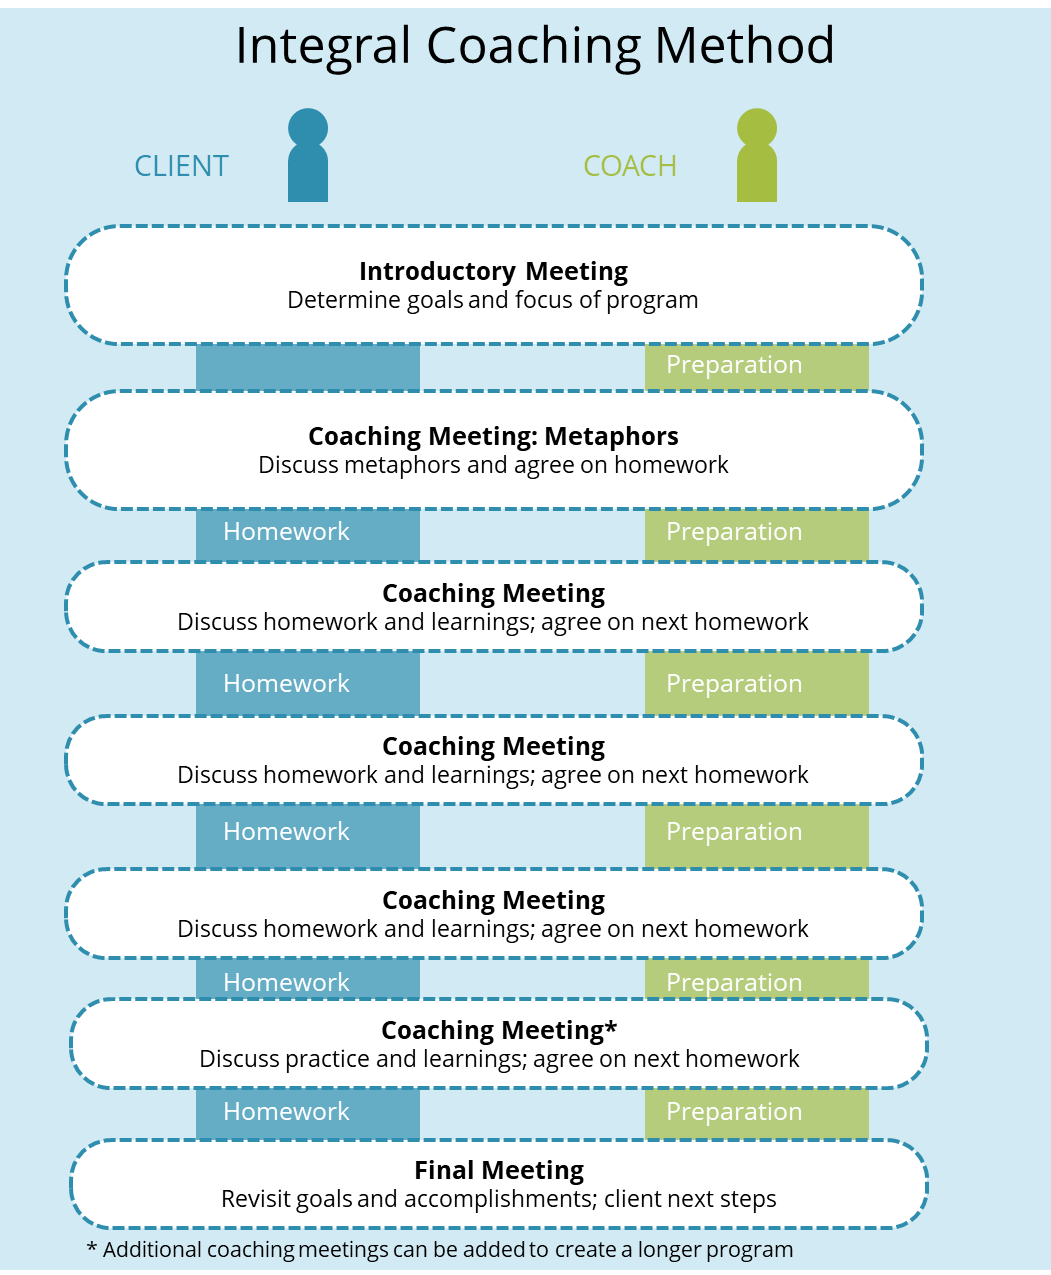 Integral-theory-method-for-leadership-coaching-program